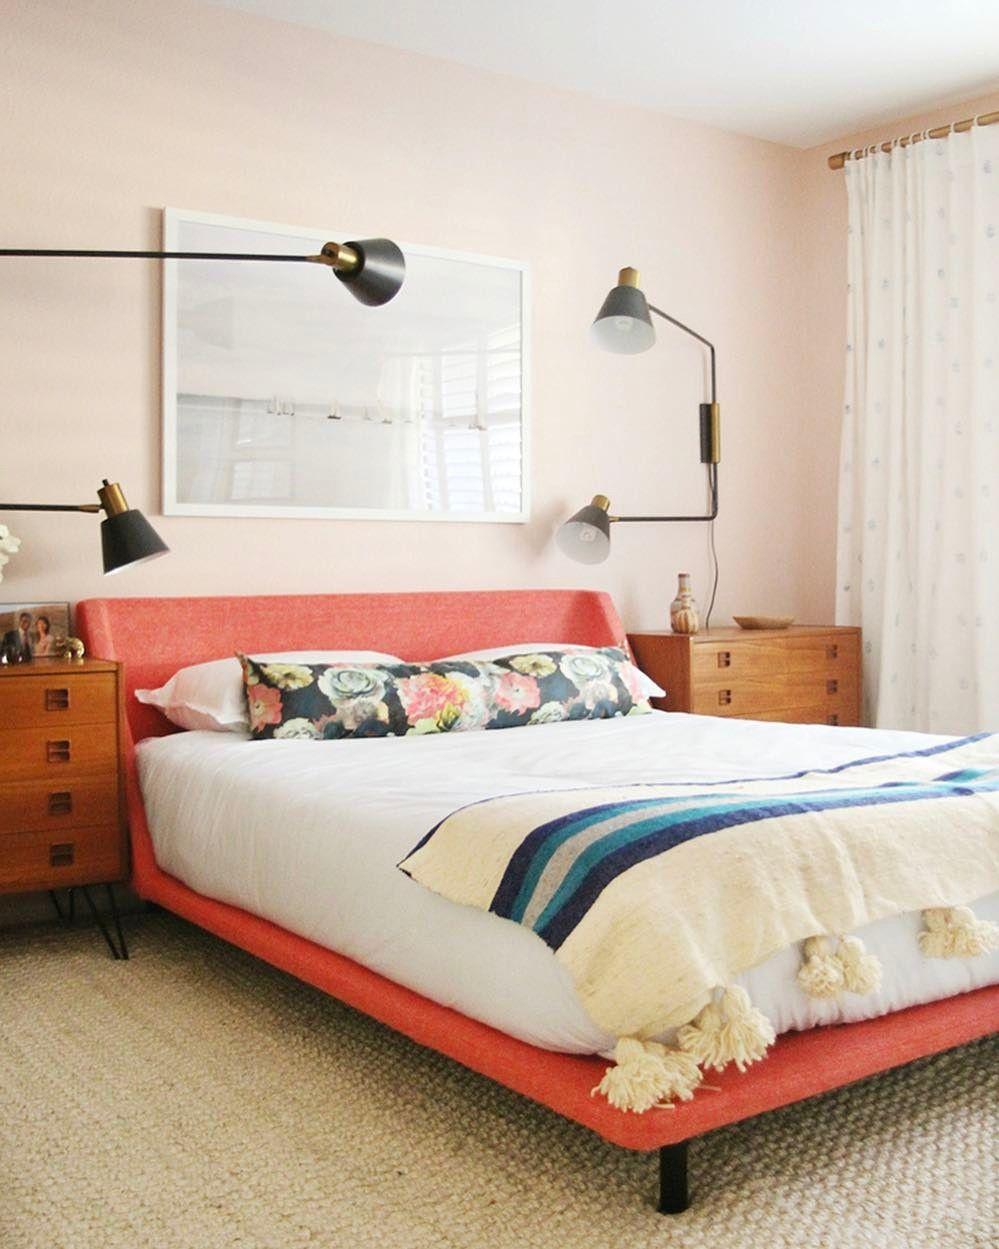 bludot bed | Bedroom redesign, Bedroom red, Bedroom decor